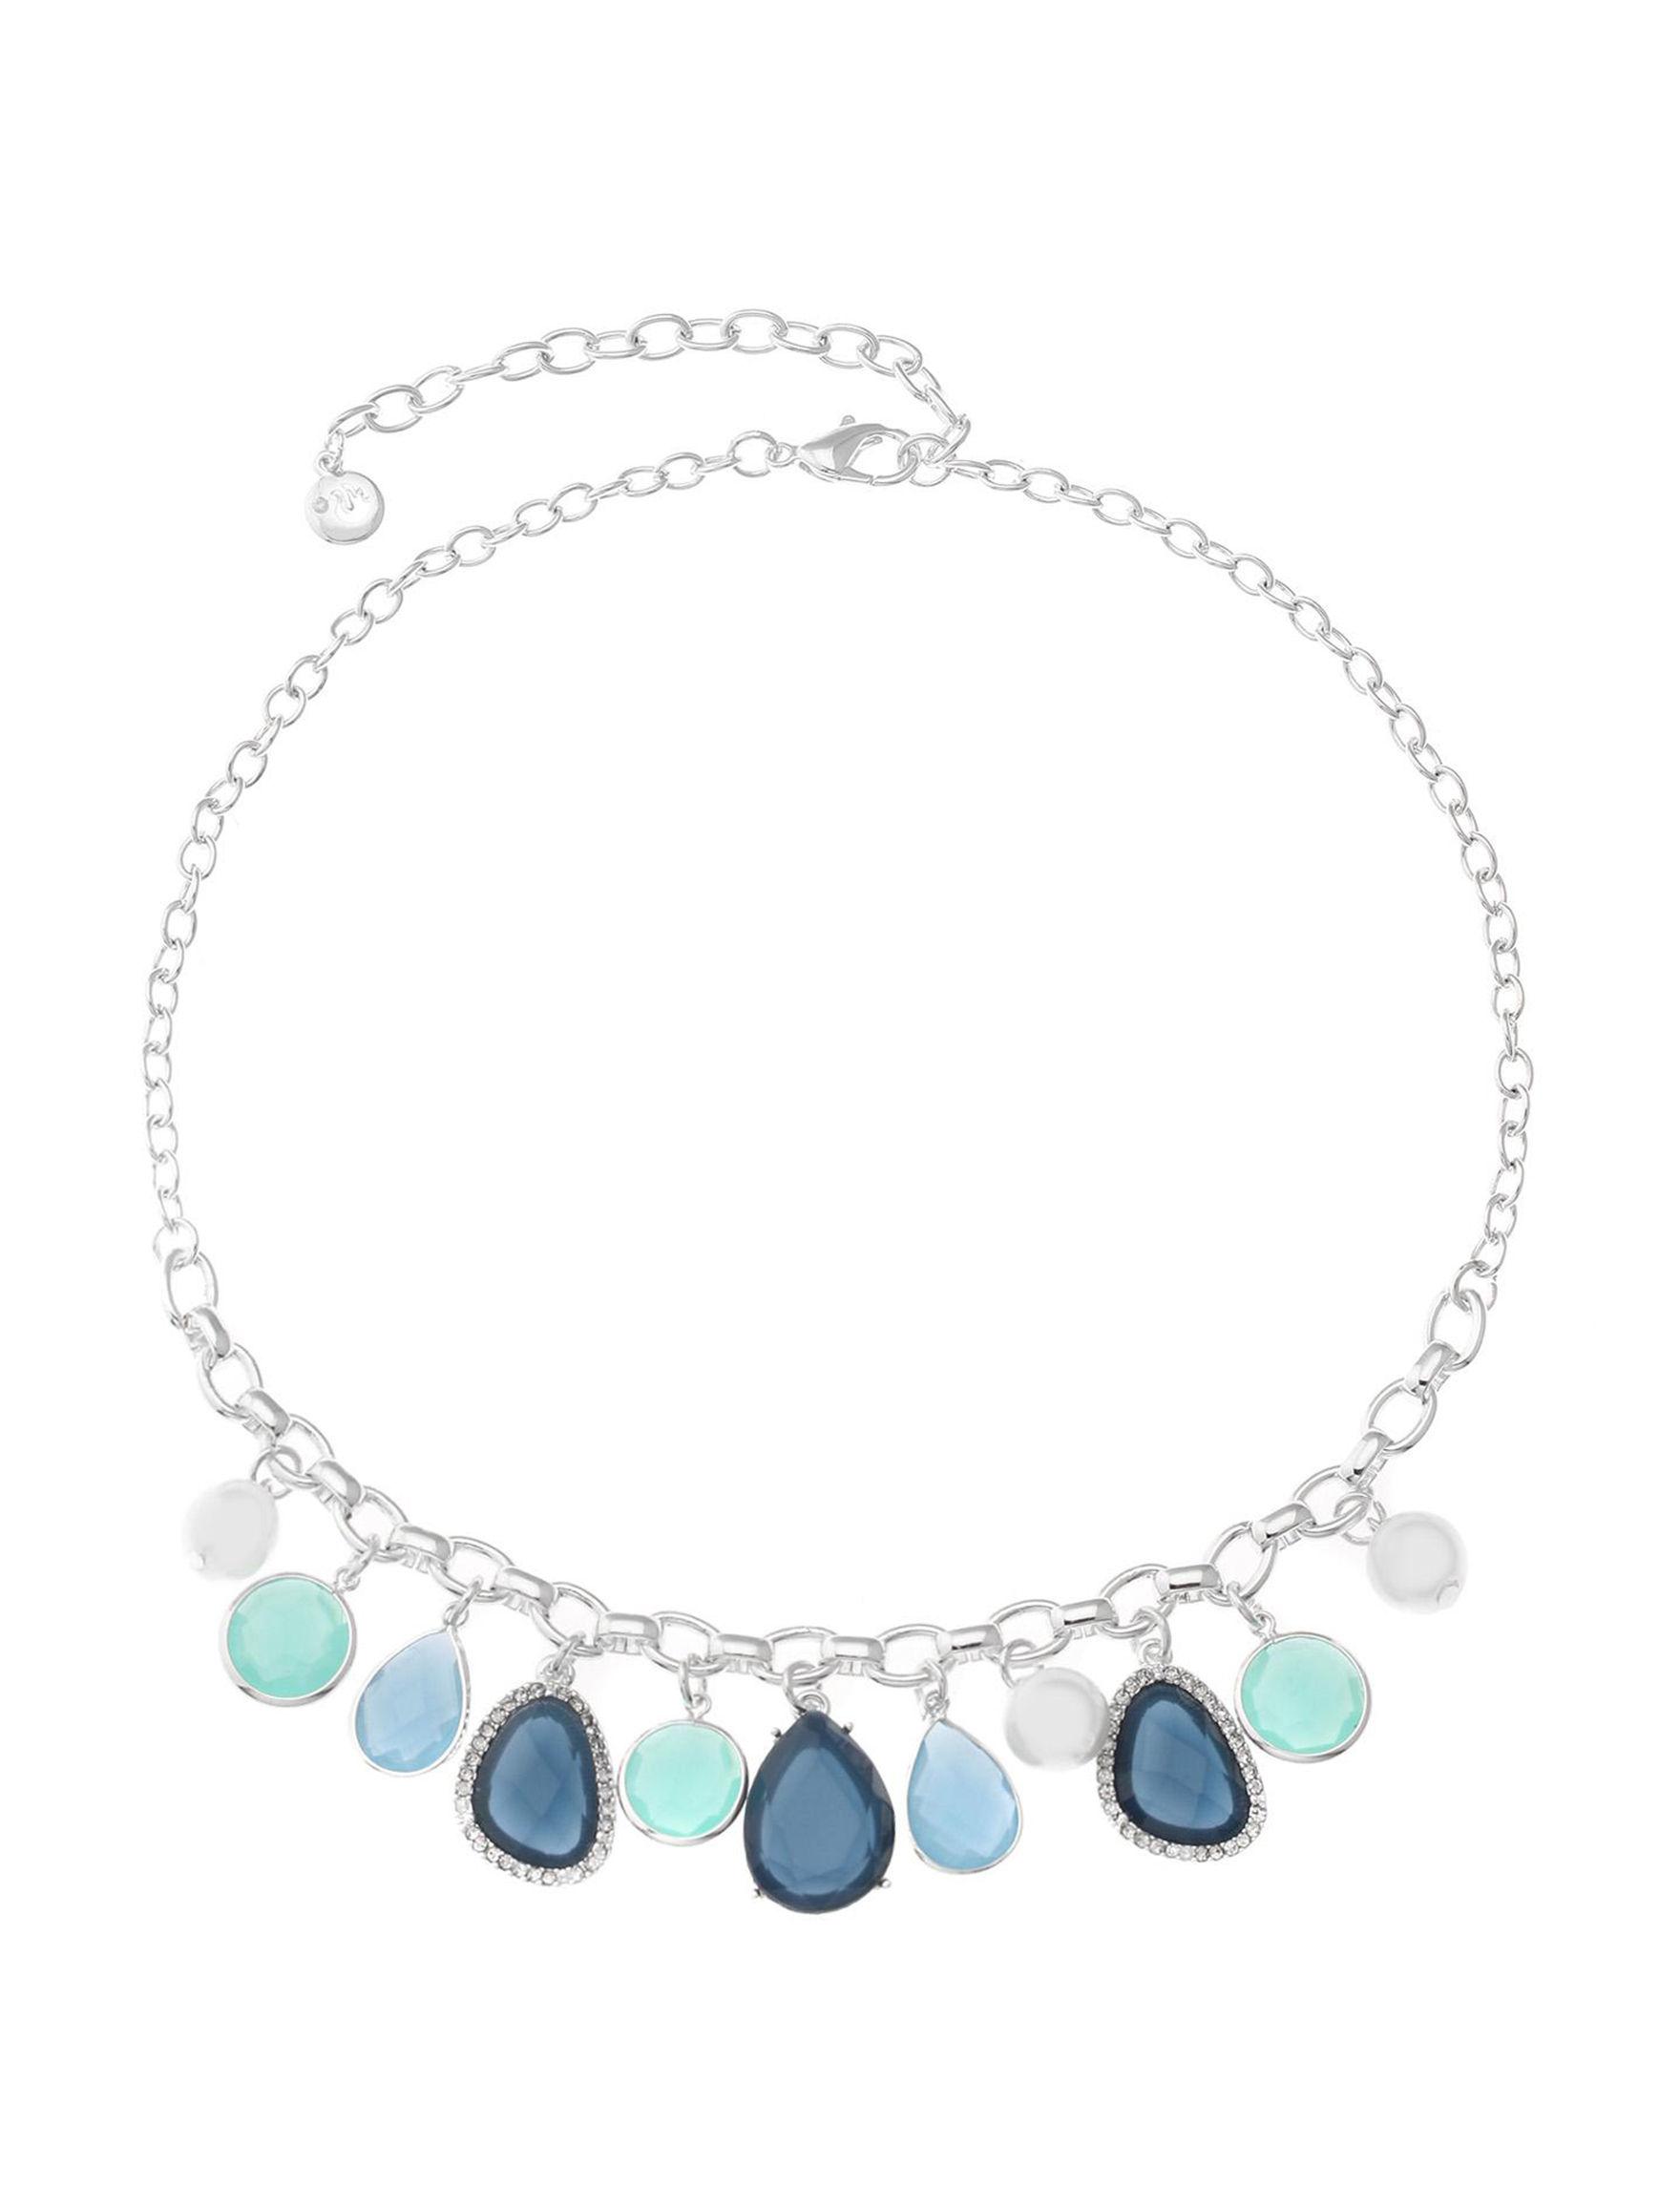 Gloria Vanderbilt Blue Necklaces & Pendants Fashion Jewelry